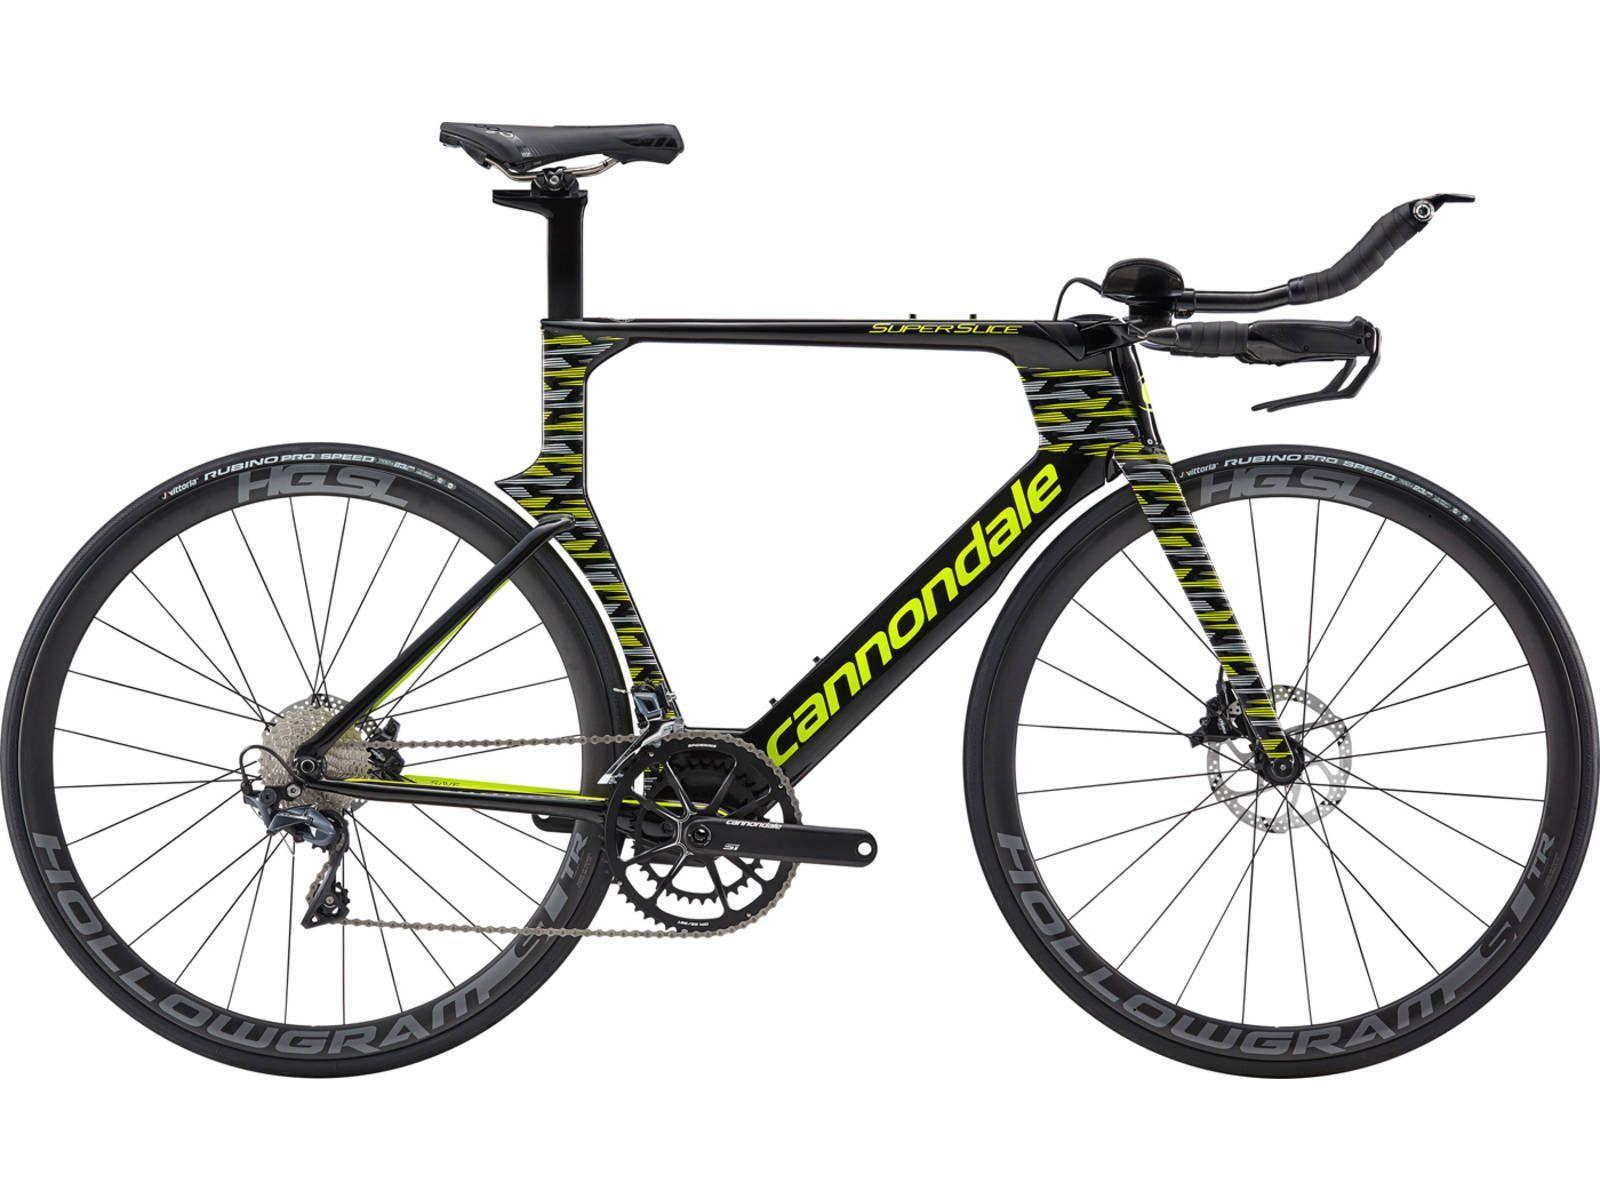 Rennrad TT/Triathlon Cannondale SuperSlice Ultegra (Carbon/Ultegra/8.6kg) - 2019 (52,54,56cm)